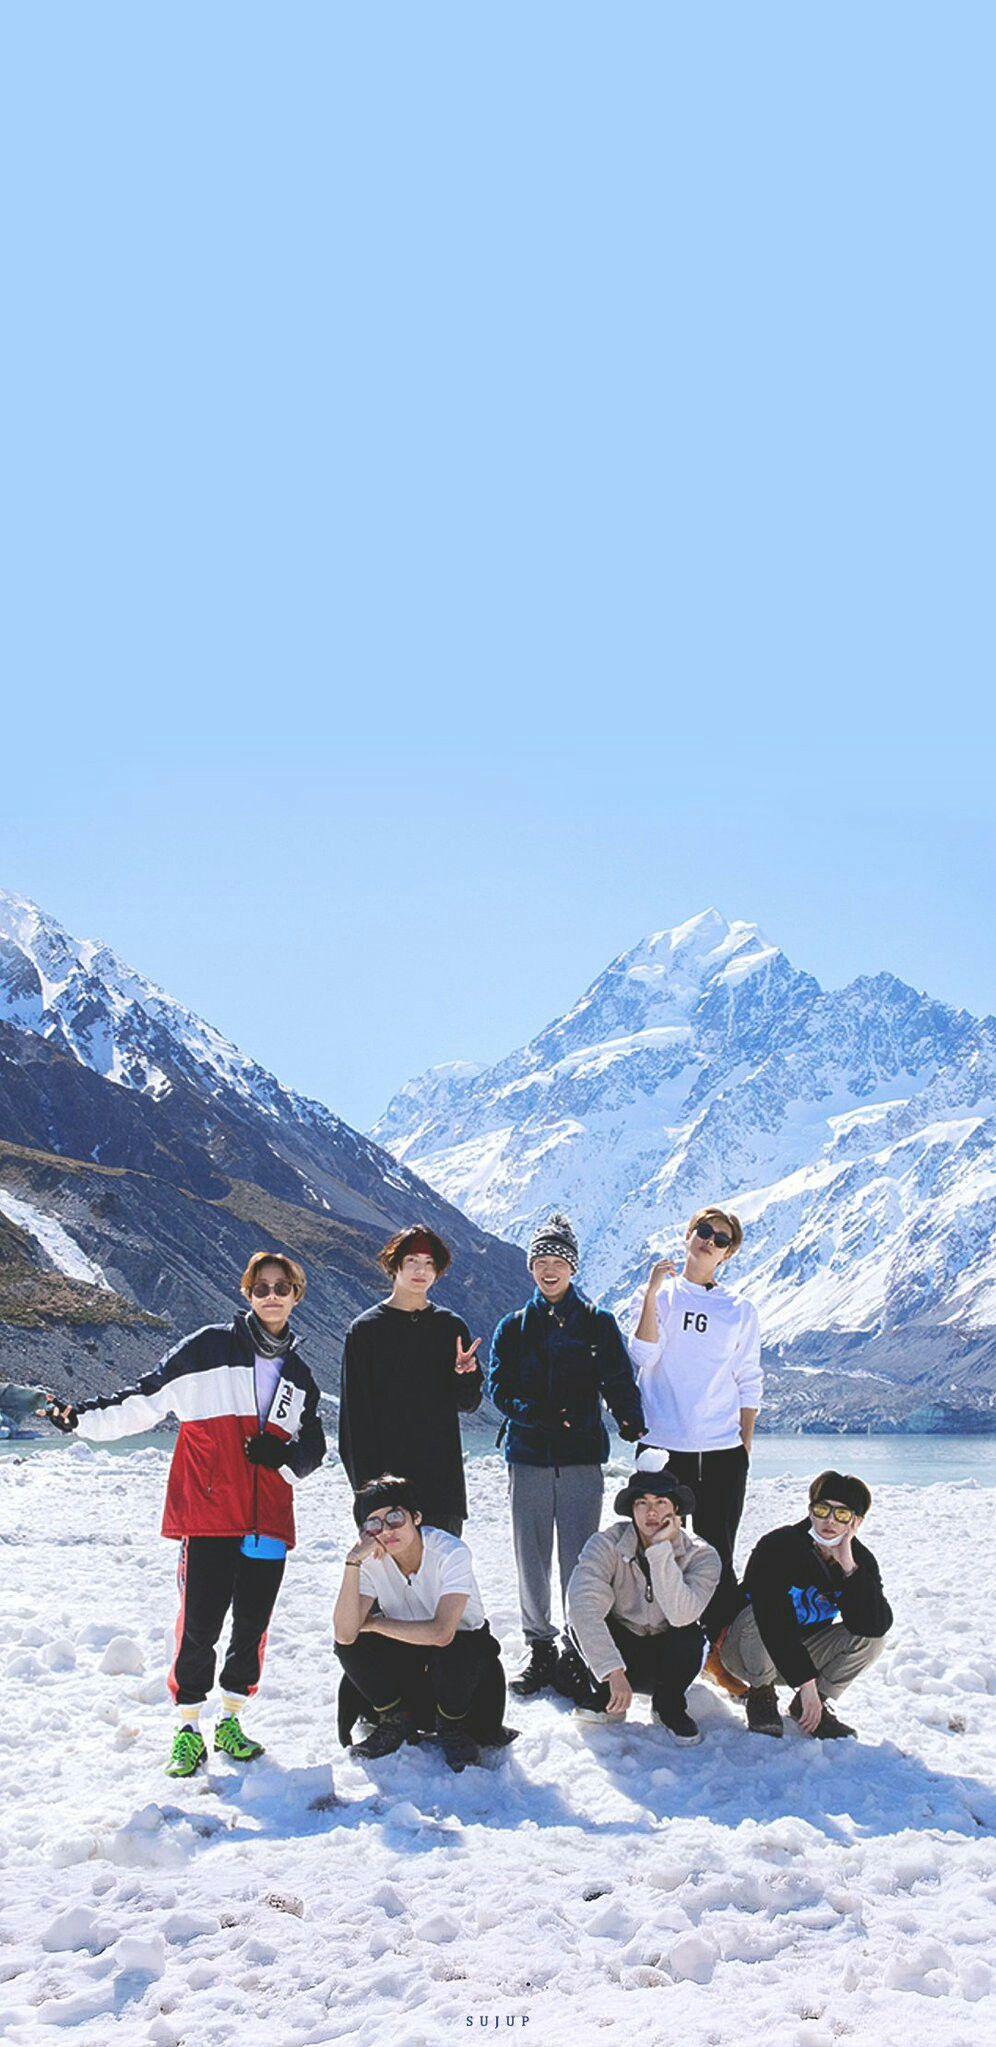 Bts 방탄소년단 Bon Voyage Season 4 Teaser 방탄소년단의 네 번째 여행 Bts Bon Voyage Bts Wallpaper Bts Pictures